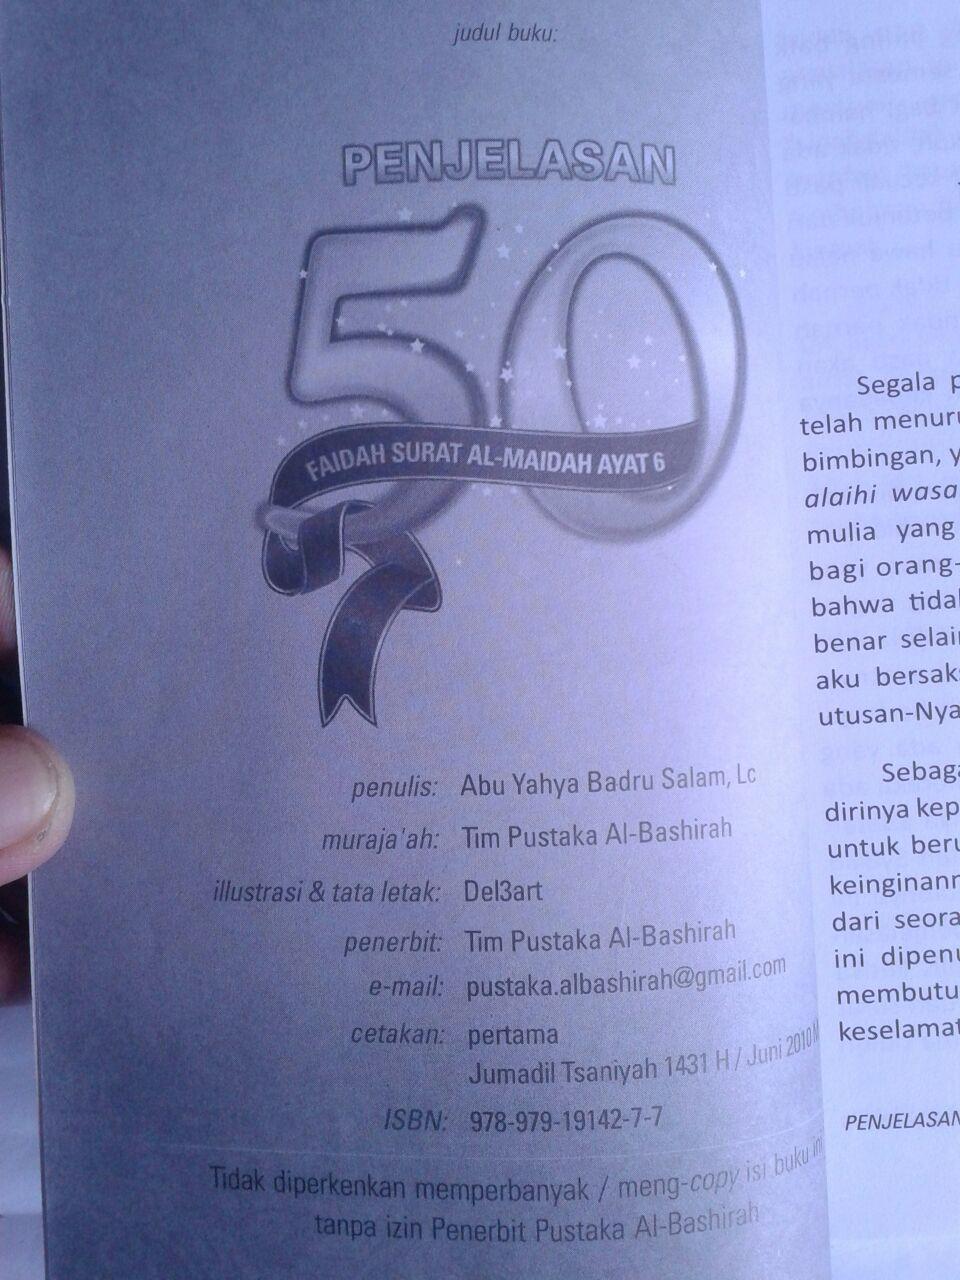 Buku Penjelasan 50 Faidah Surat Al-Maidah Ayat 6 isi 3